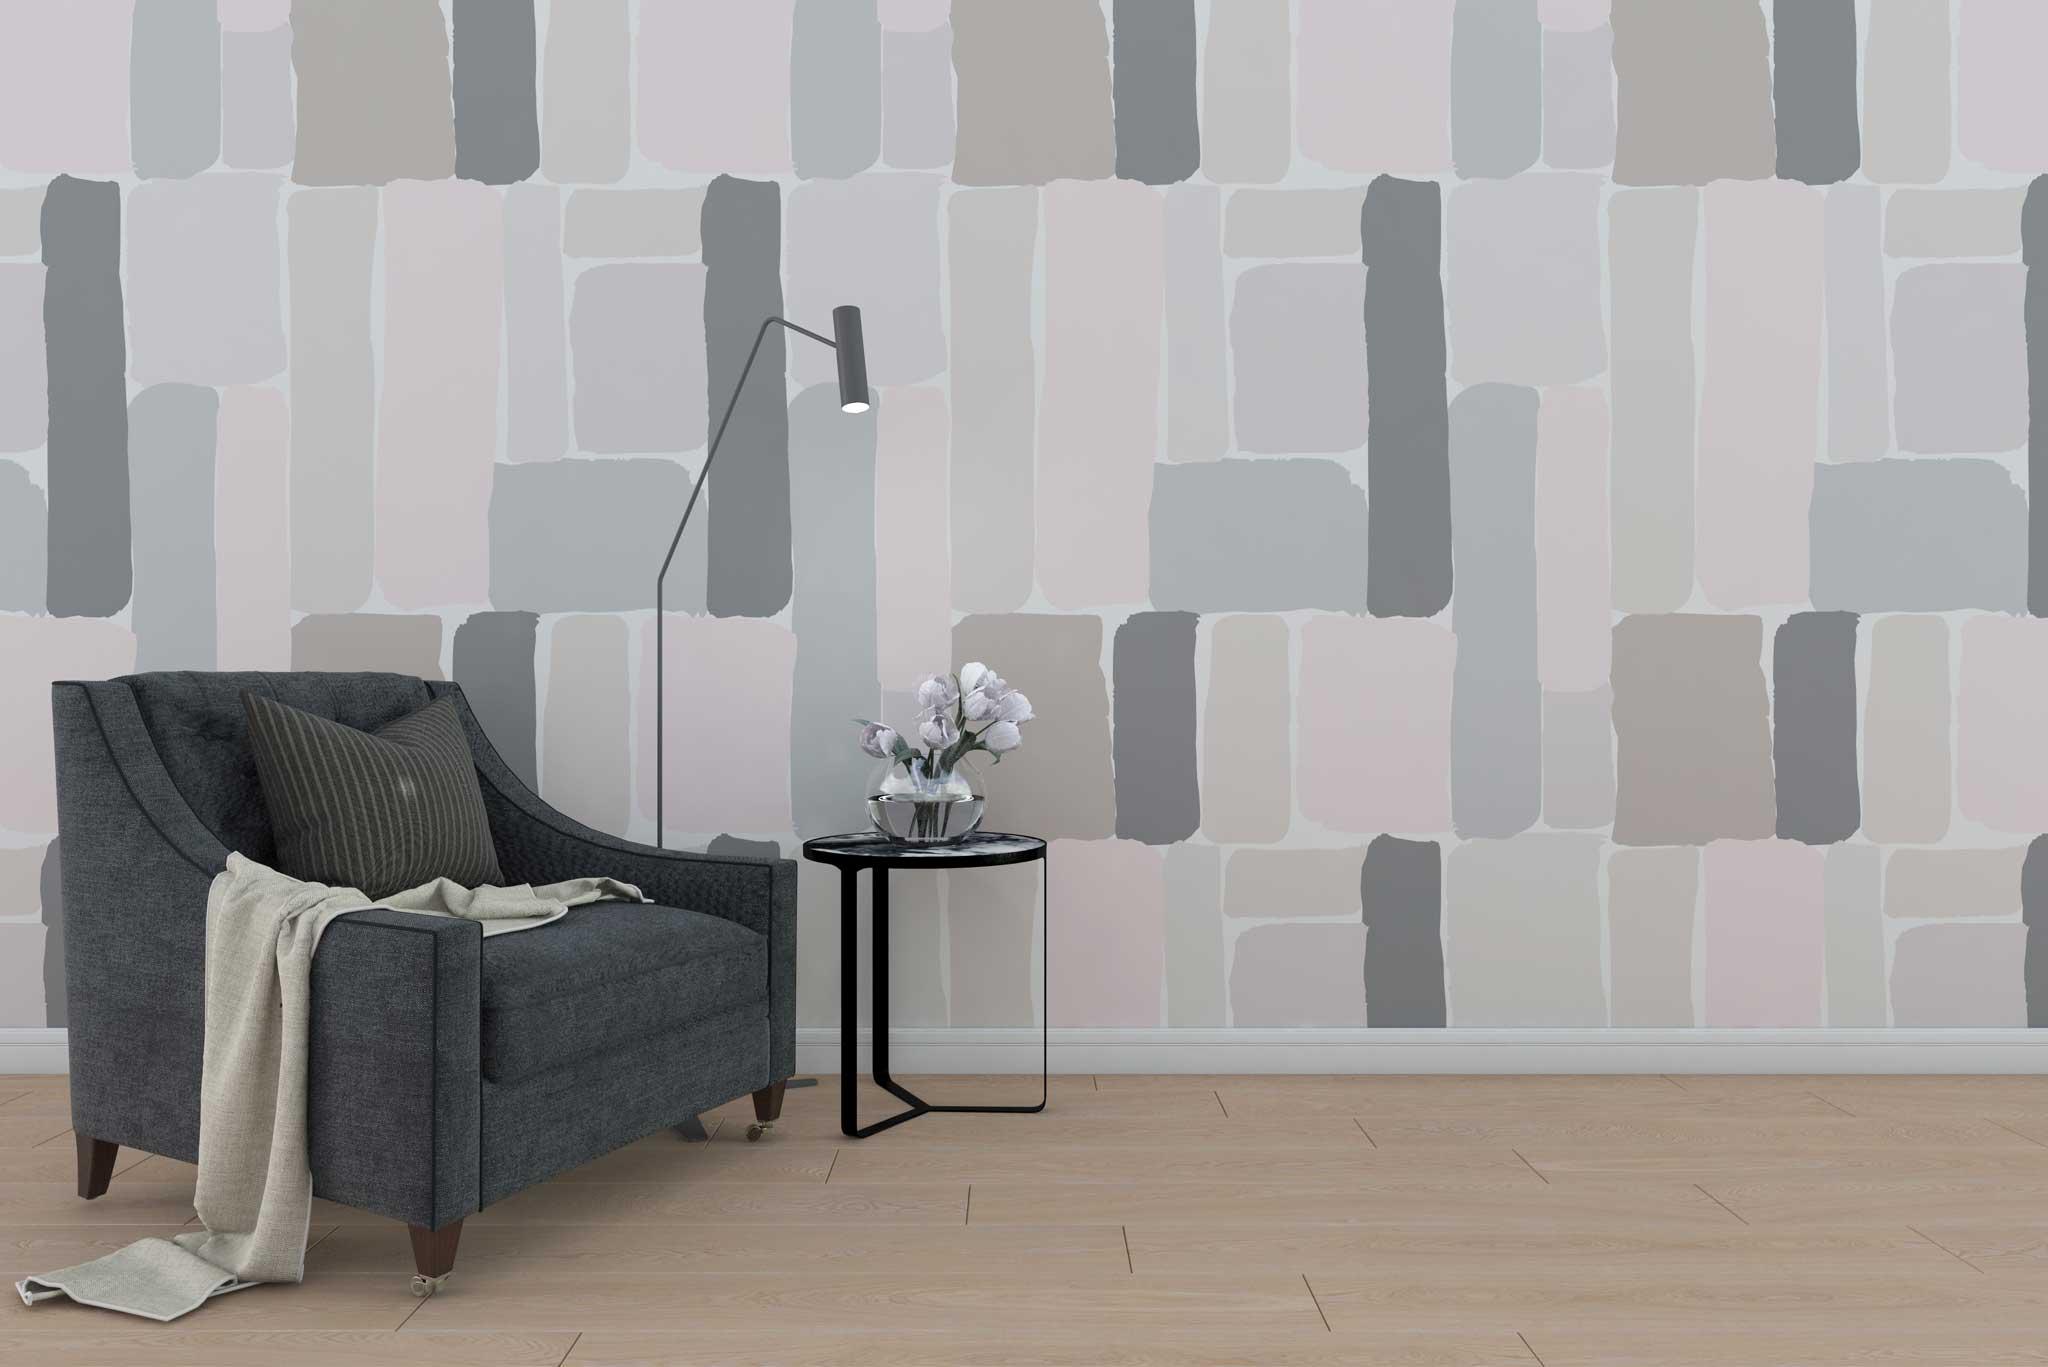 tapet-fototapet-decor-design-customizabil-comanda-personalizat-bucuresti-daring-prints-mural-motiv-forme-geometrice-culori-pastel-roz-gri